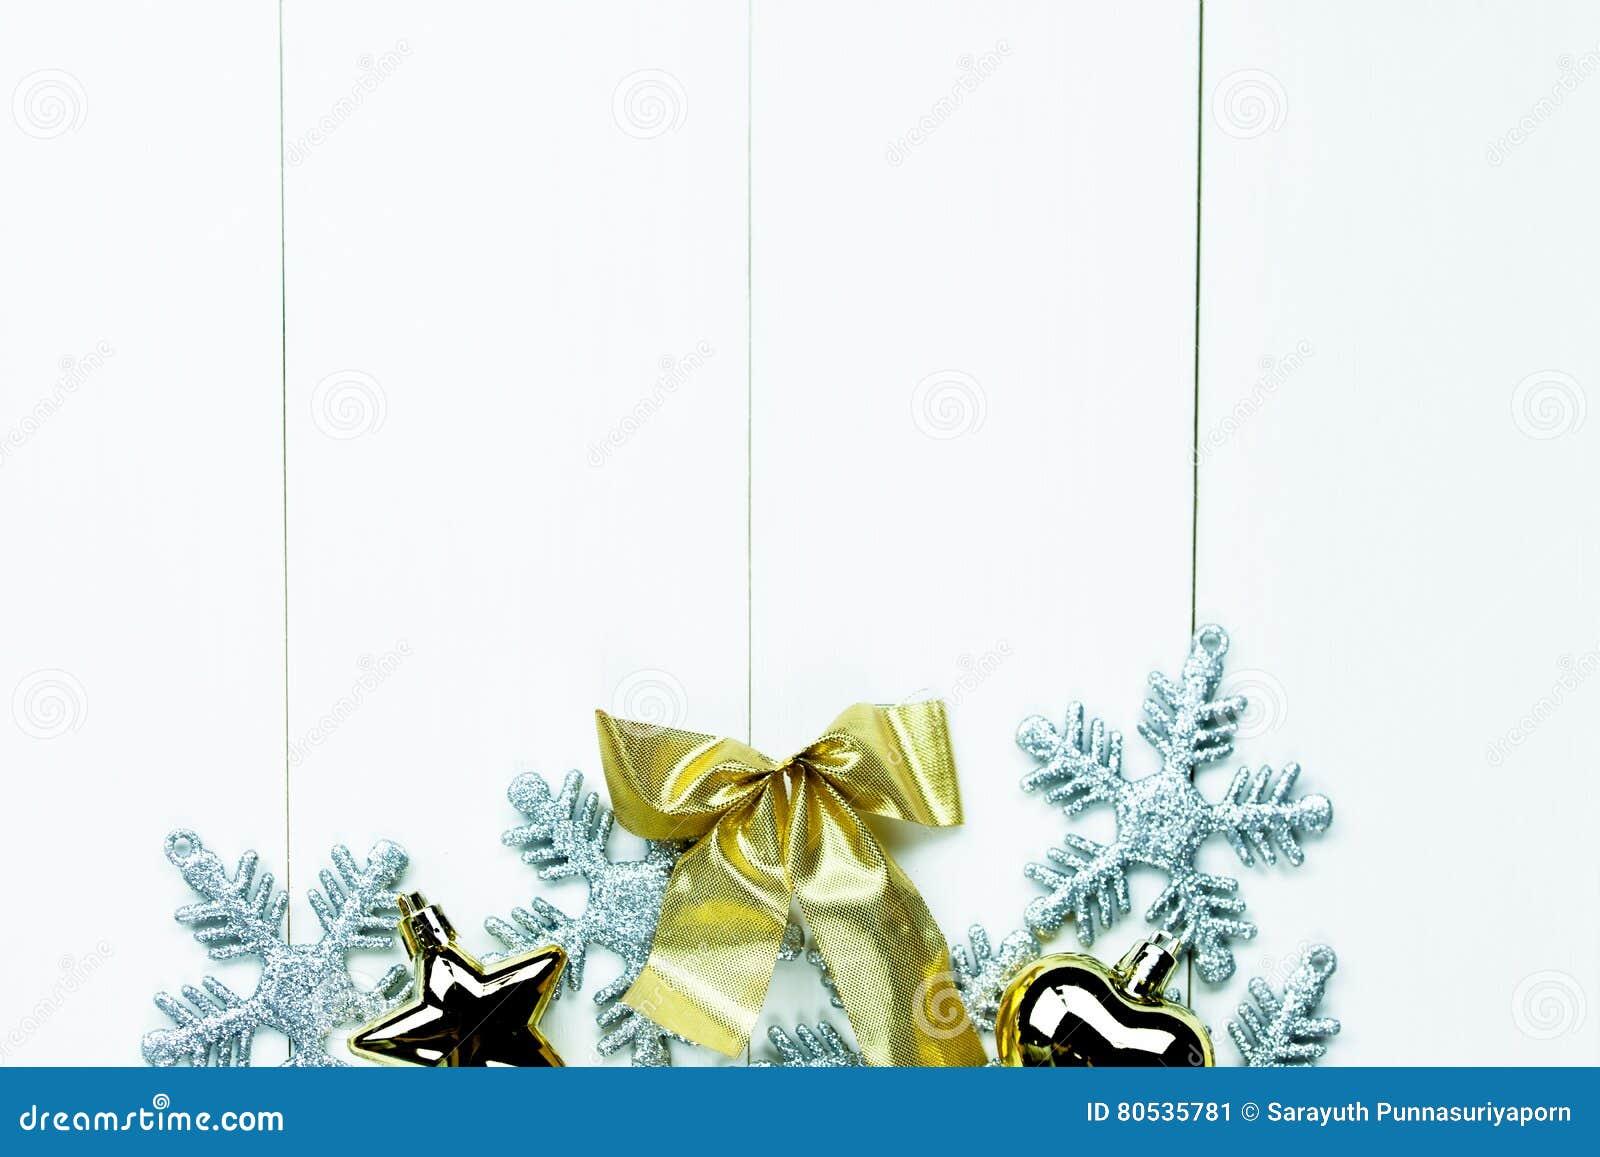 Shiny Christmas Holiday Ornaments On White Wood Background Ready